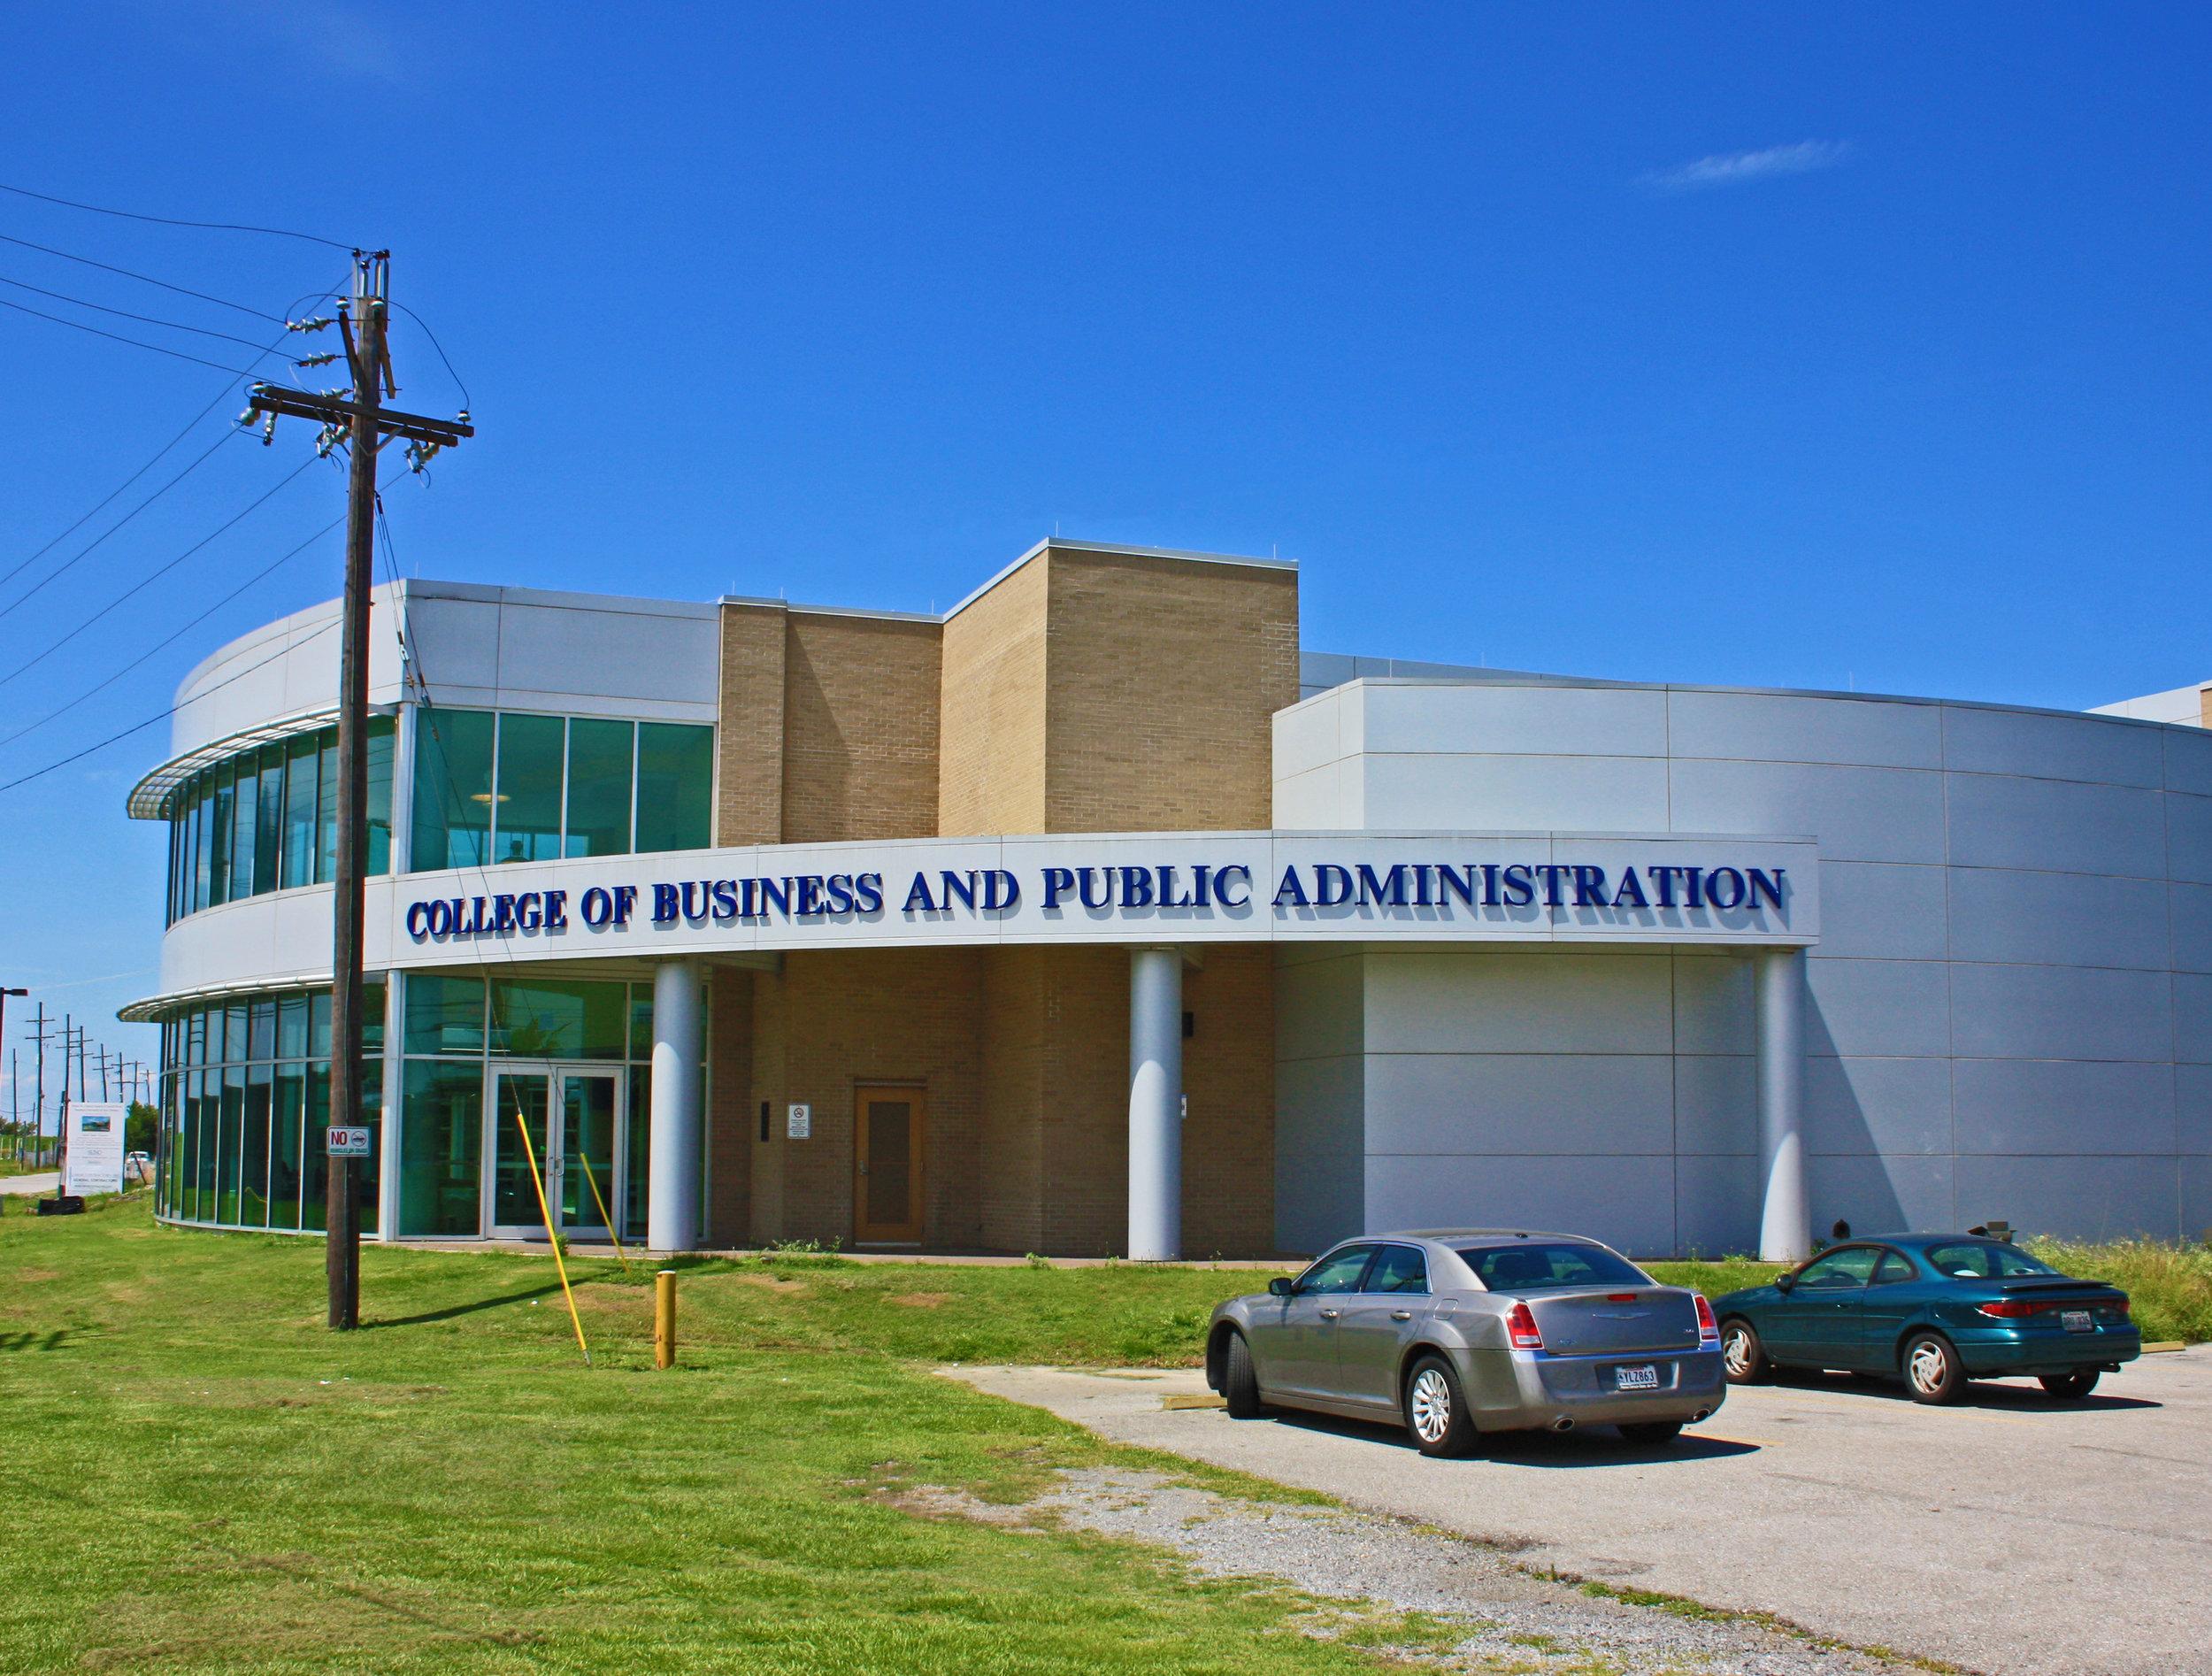 SUNO College of Business